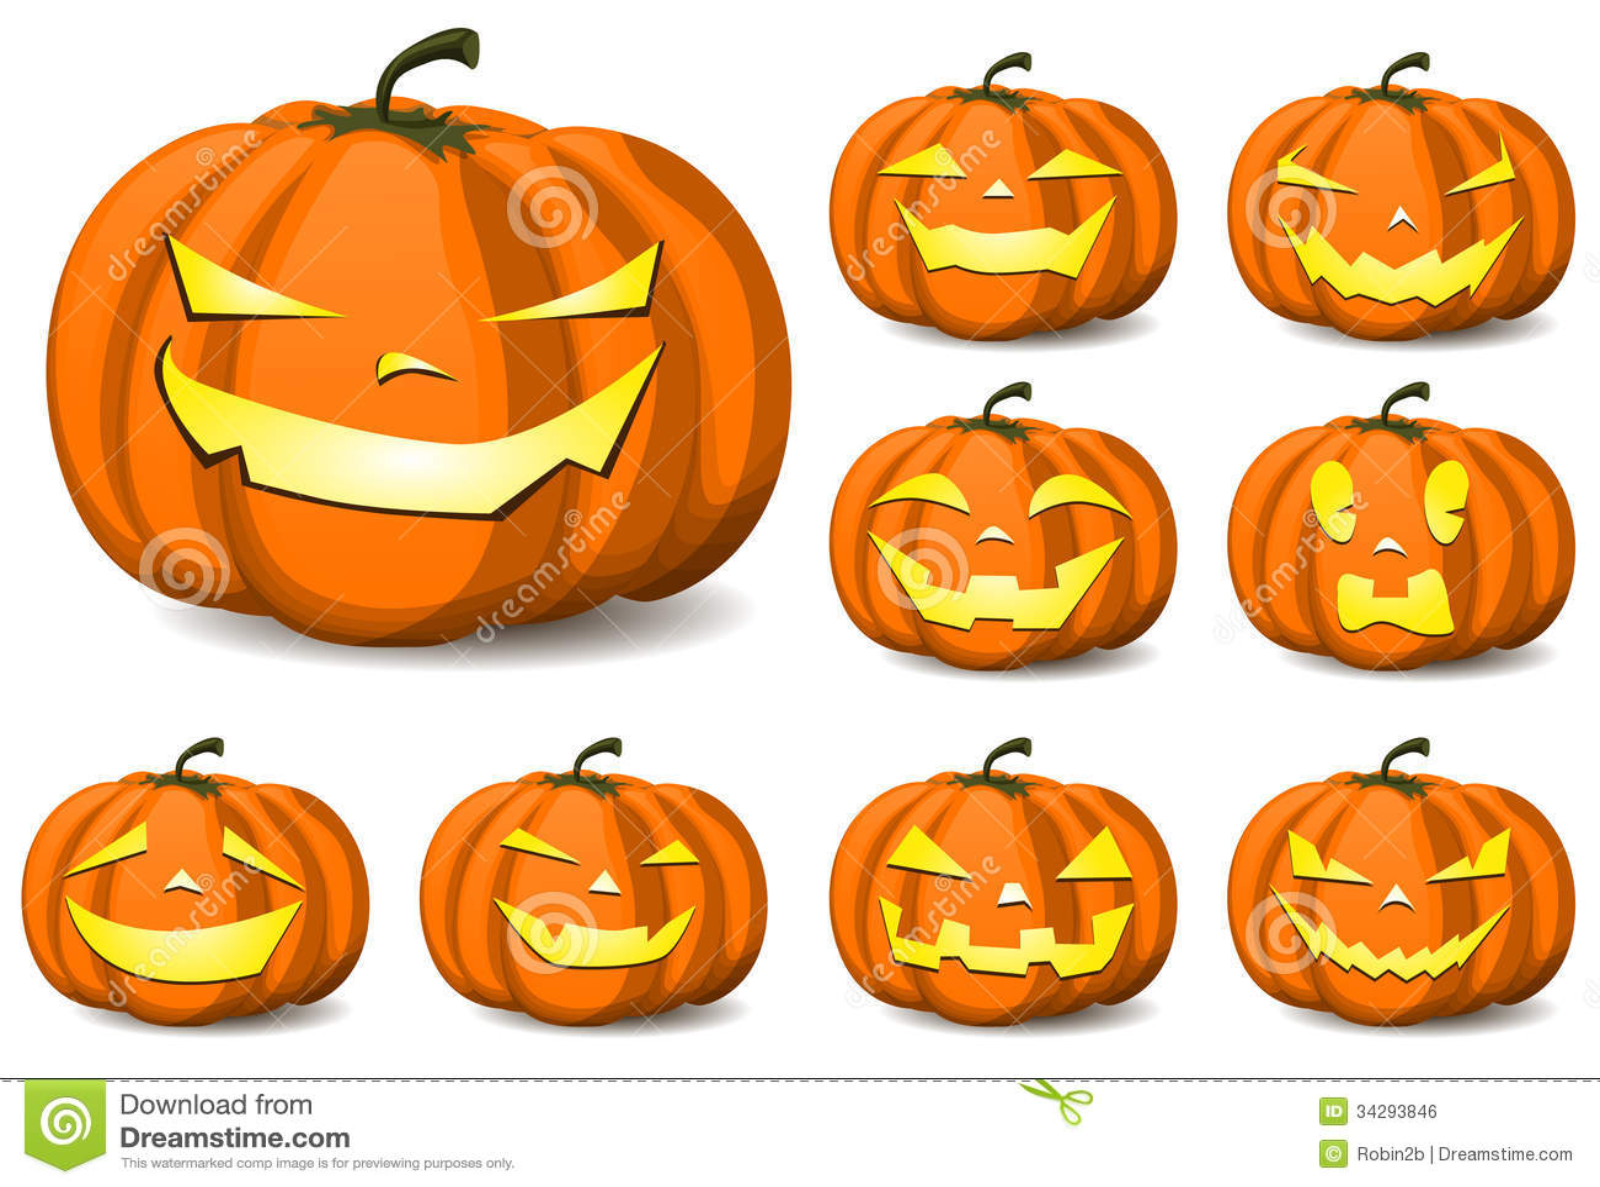 Halloween Pumpkins Royalty Free Stock Image Image 34293846